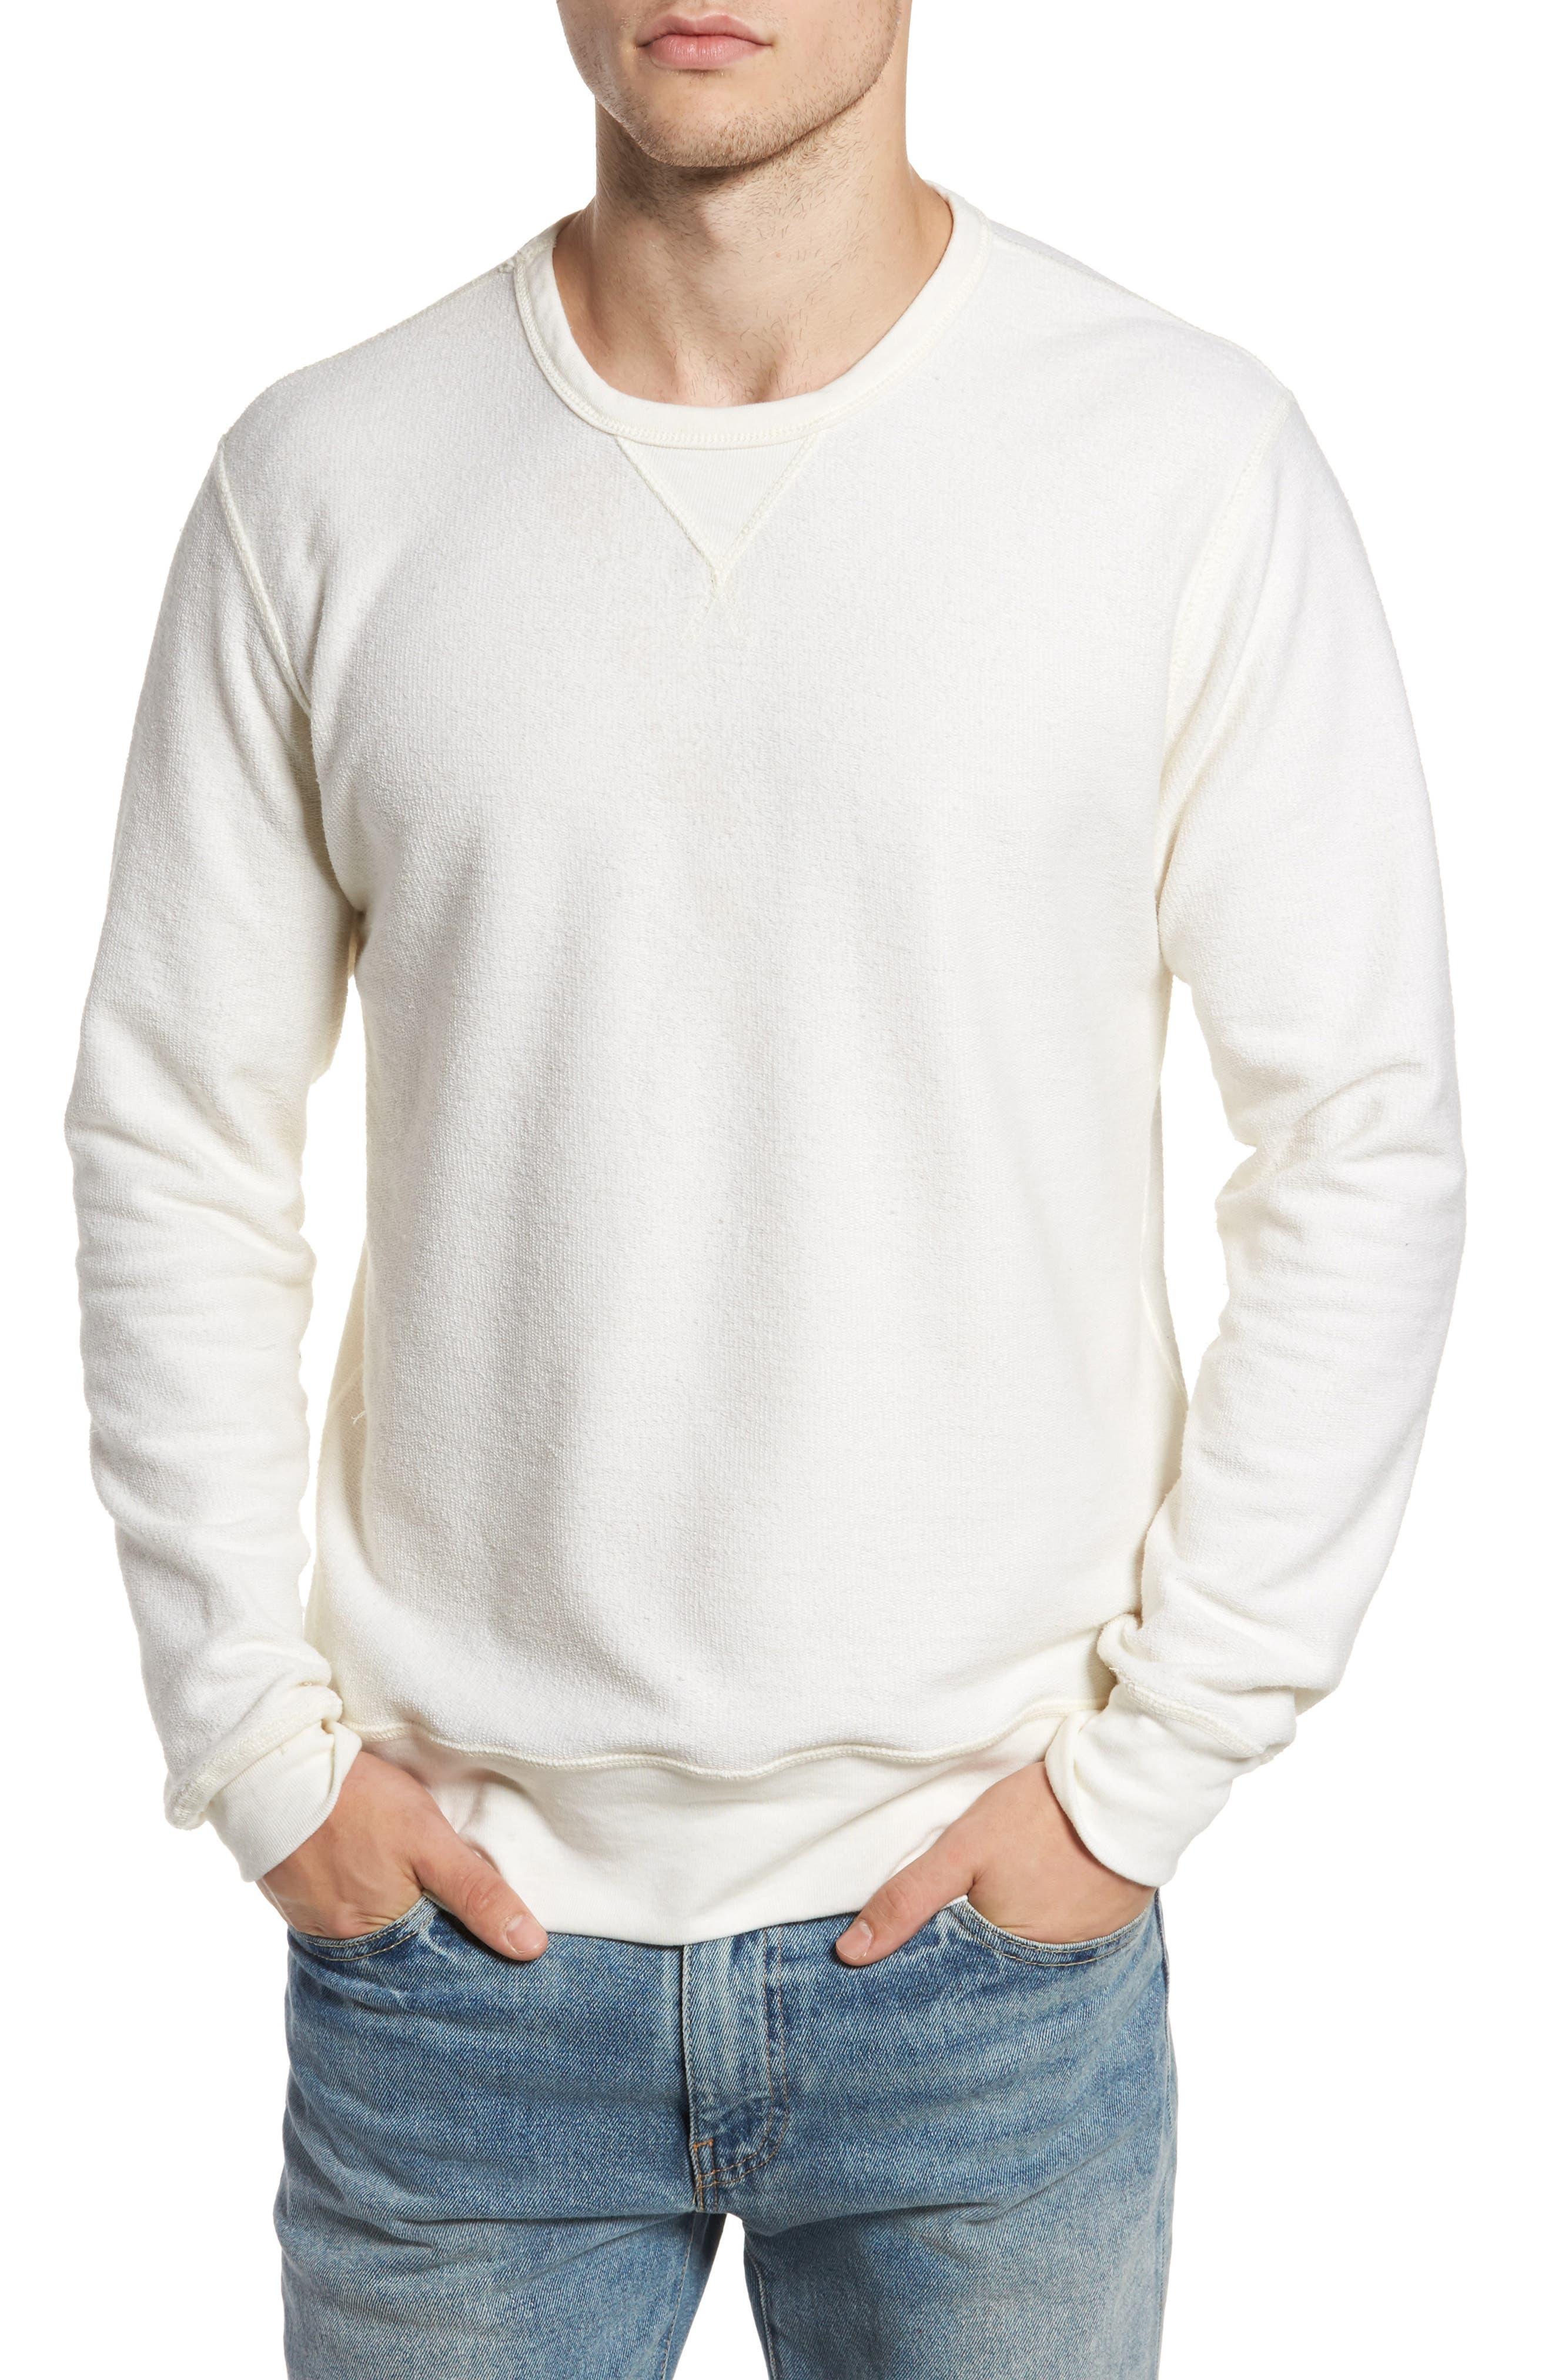 B-Side Reversible Crewneck Sweatshirt,                             Alternate thumbnail 24, color,